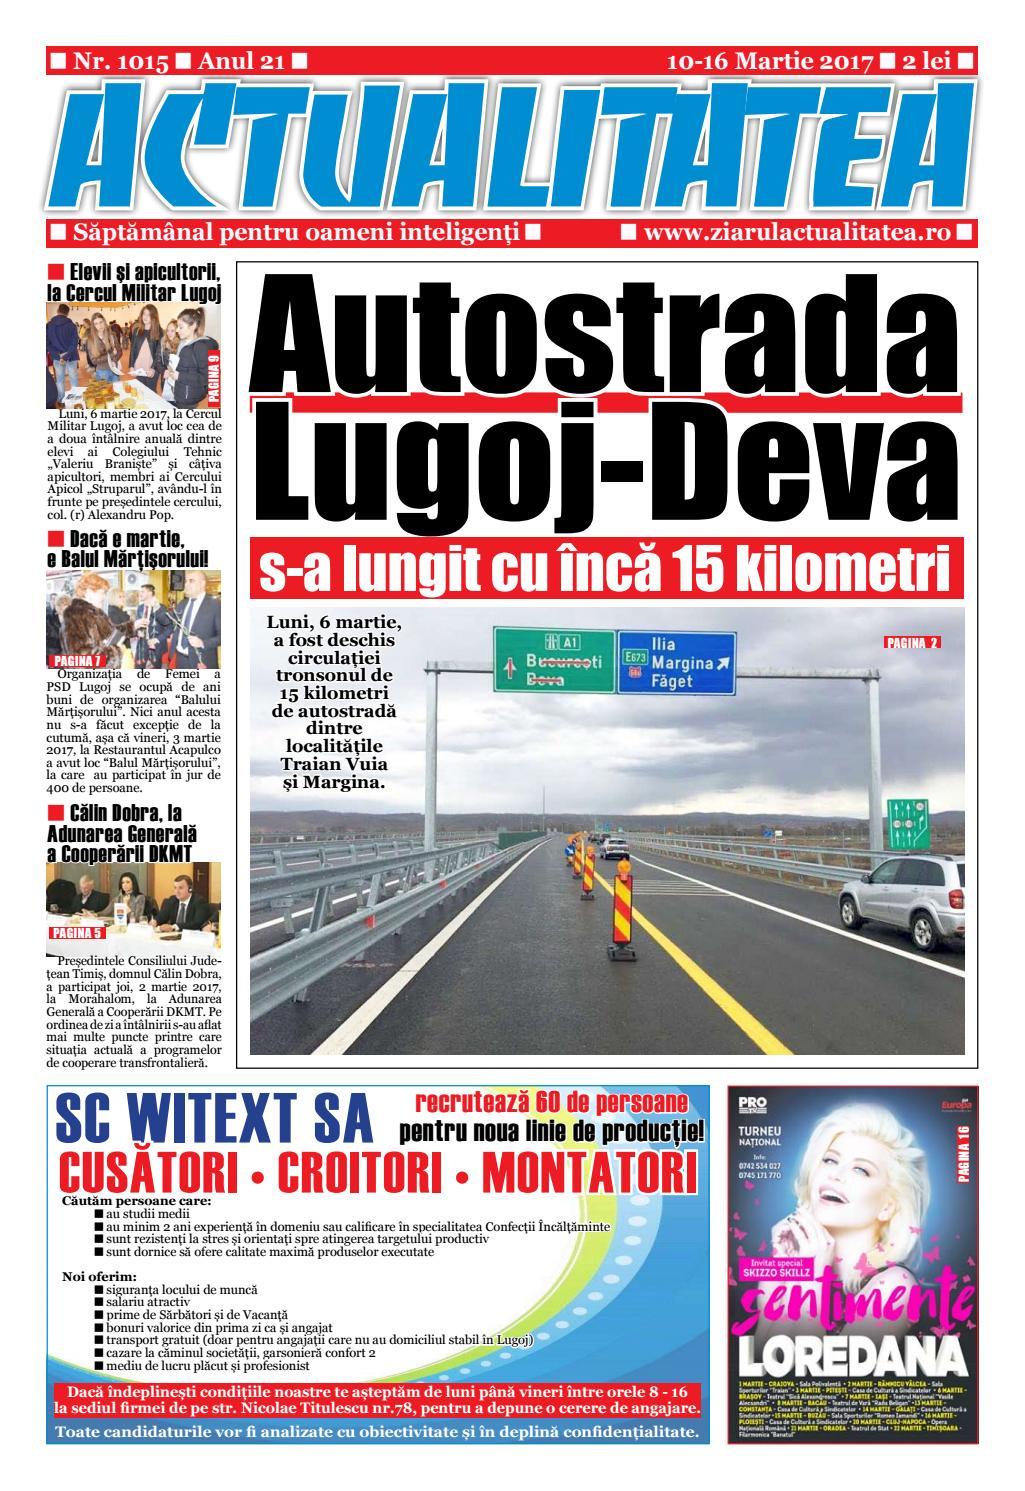 Publicat 24 femei Mioveni